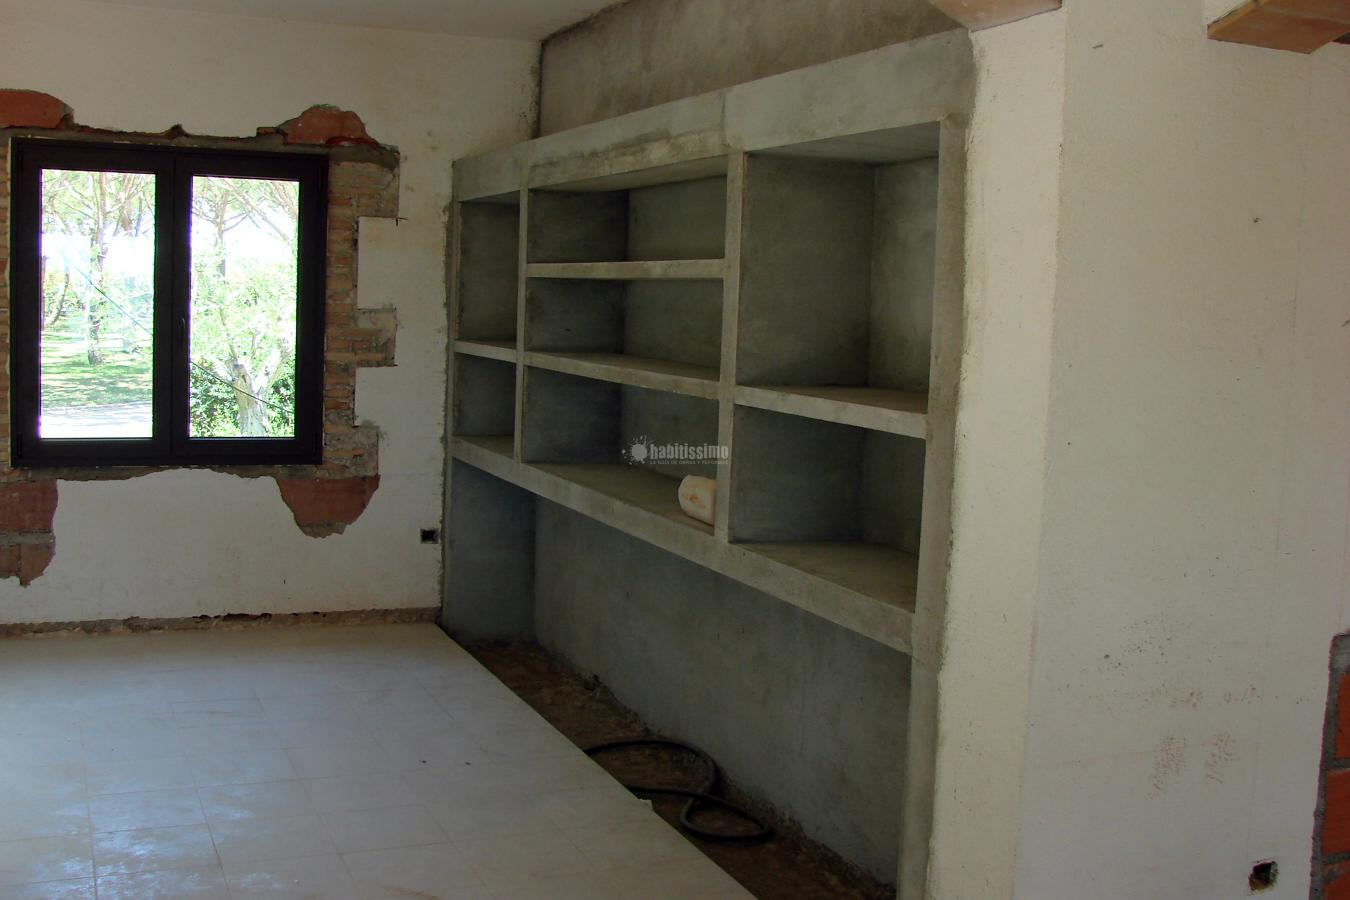 Cemento pulido a casa a l 39 empord ideas alba iles - Banos cemento pulido ...